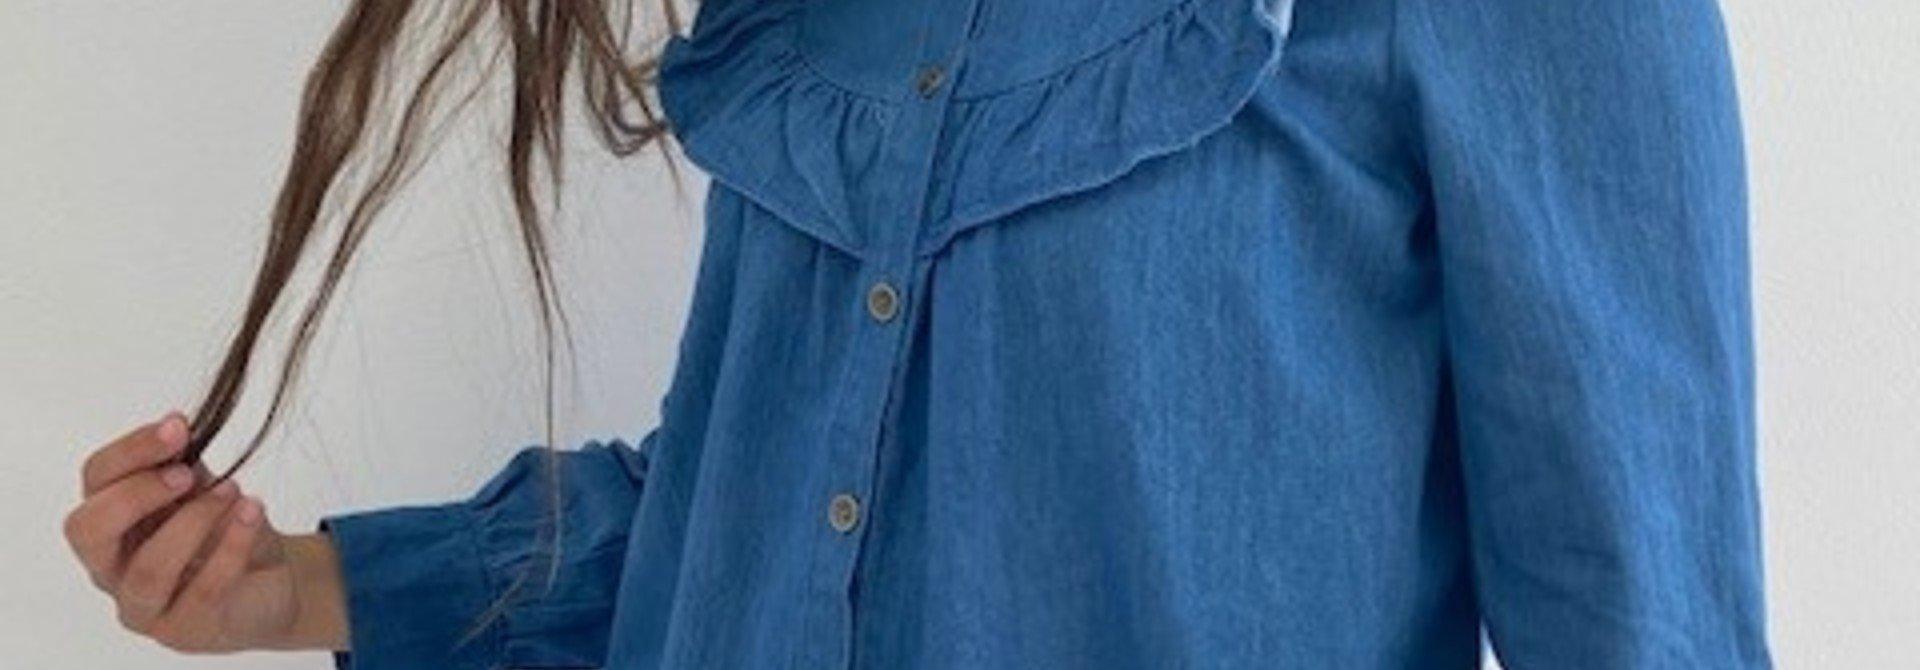 Catline ruches blouse Denim